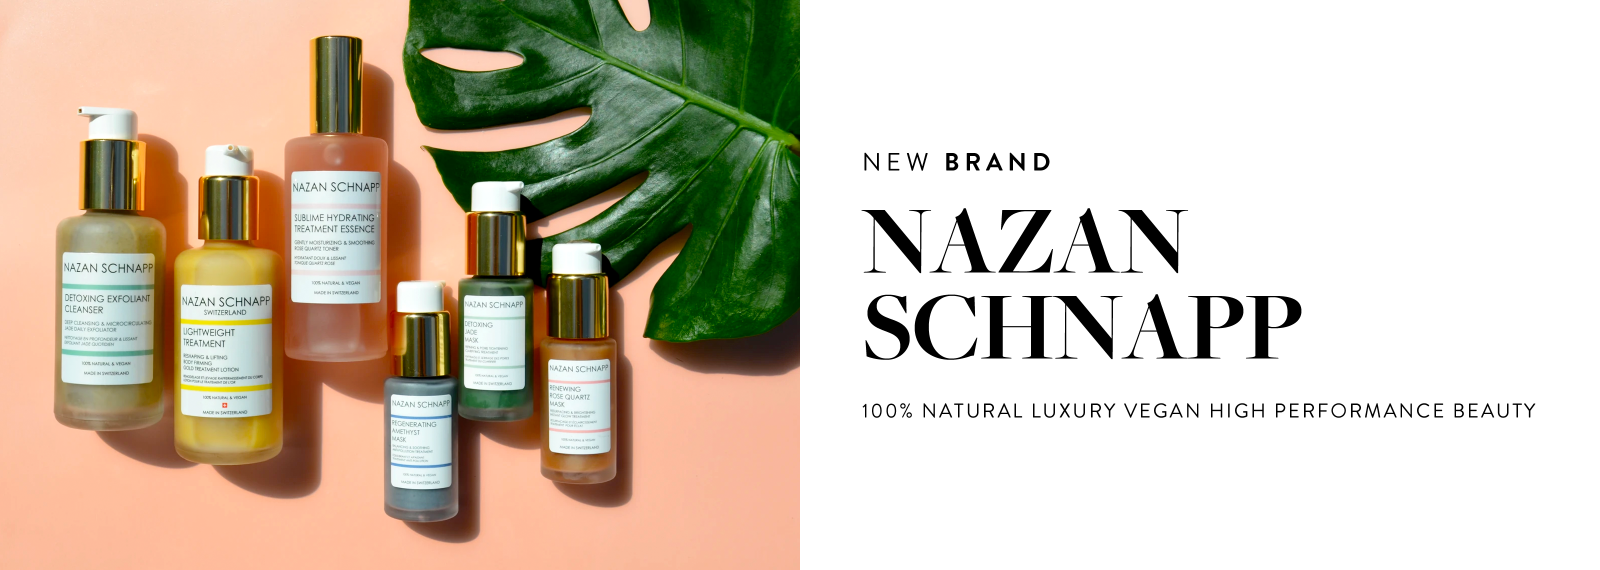 New Brand - NAZAN SCHNAPP